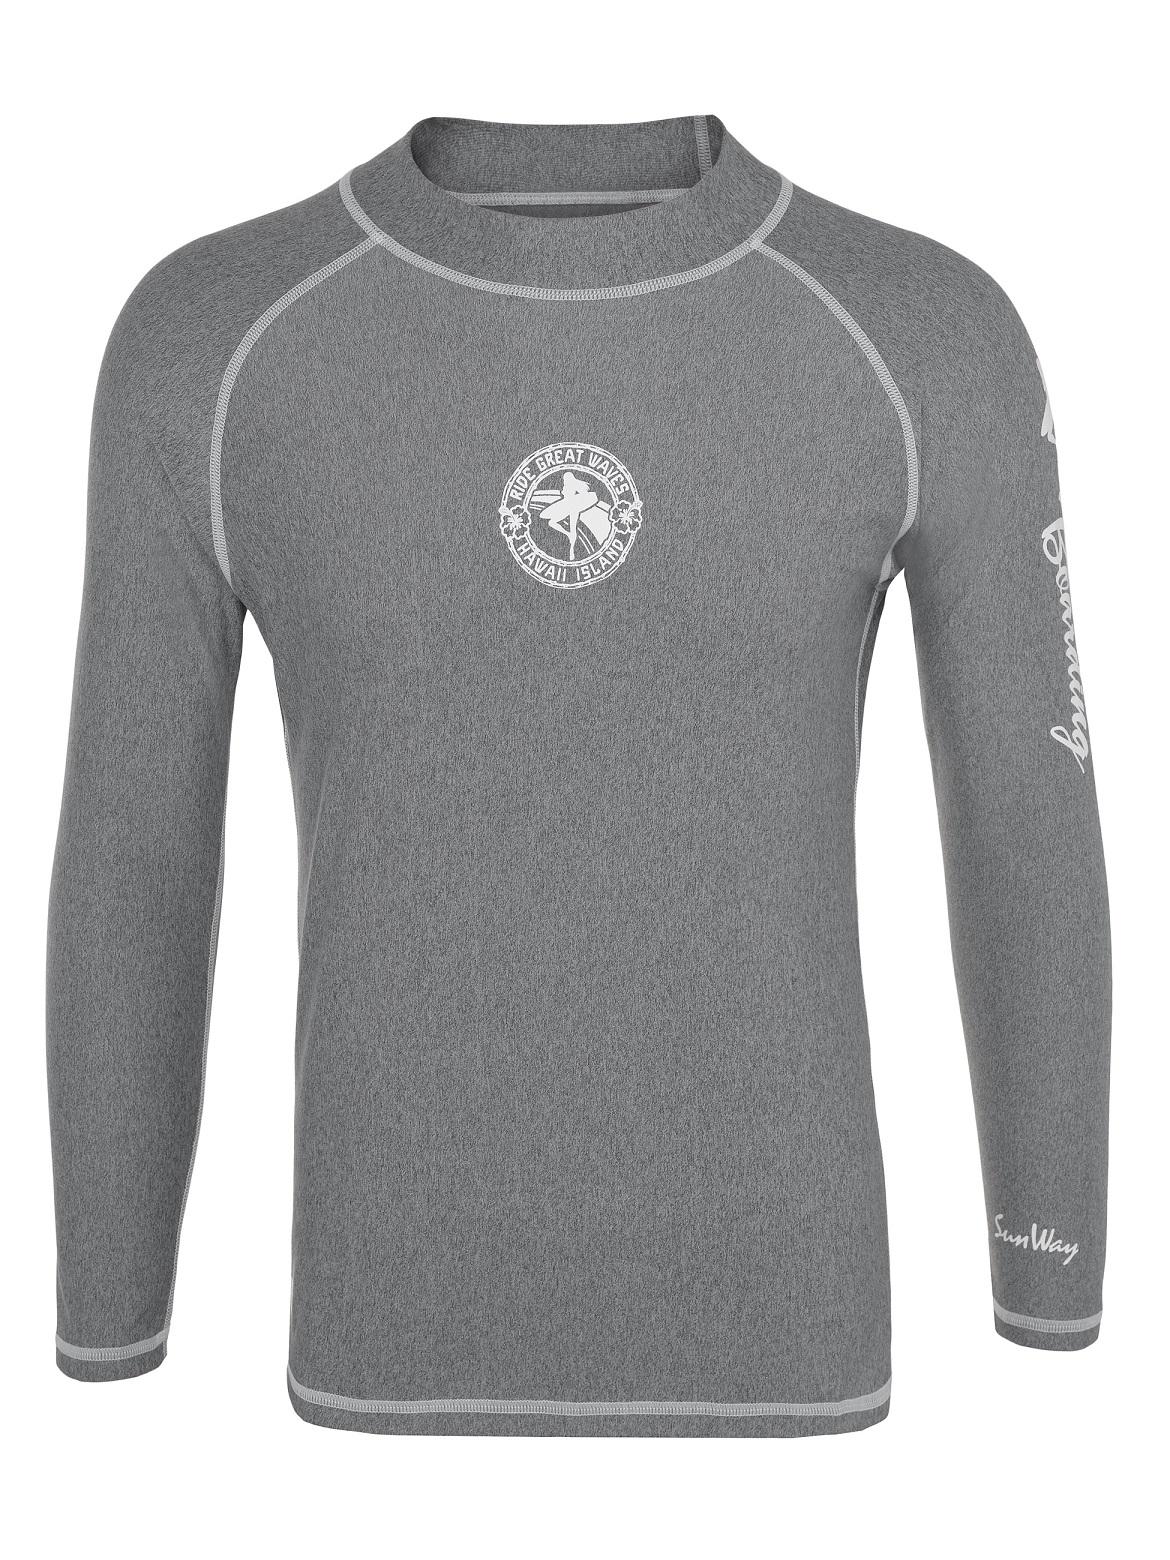 Men's Long-Sleeve Rash Guard Shirt 9258